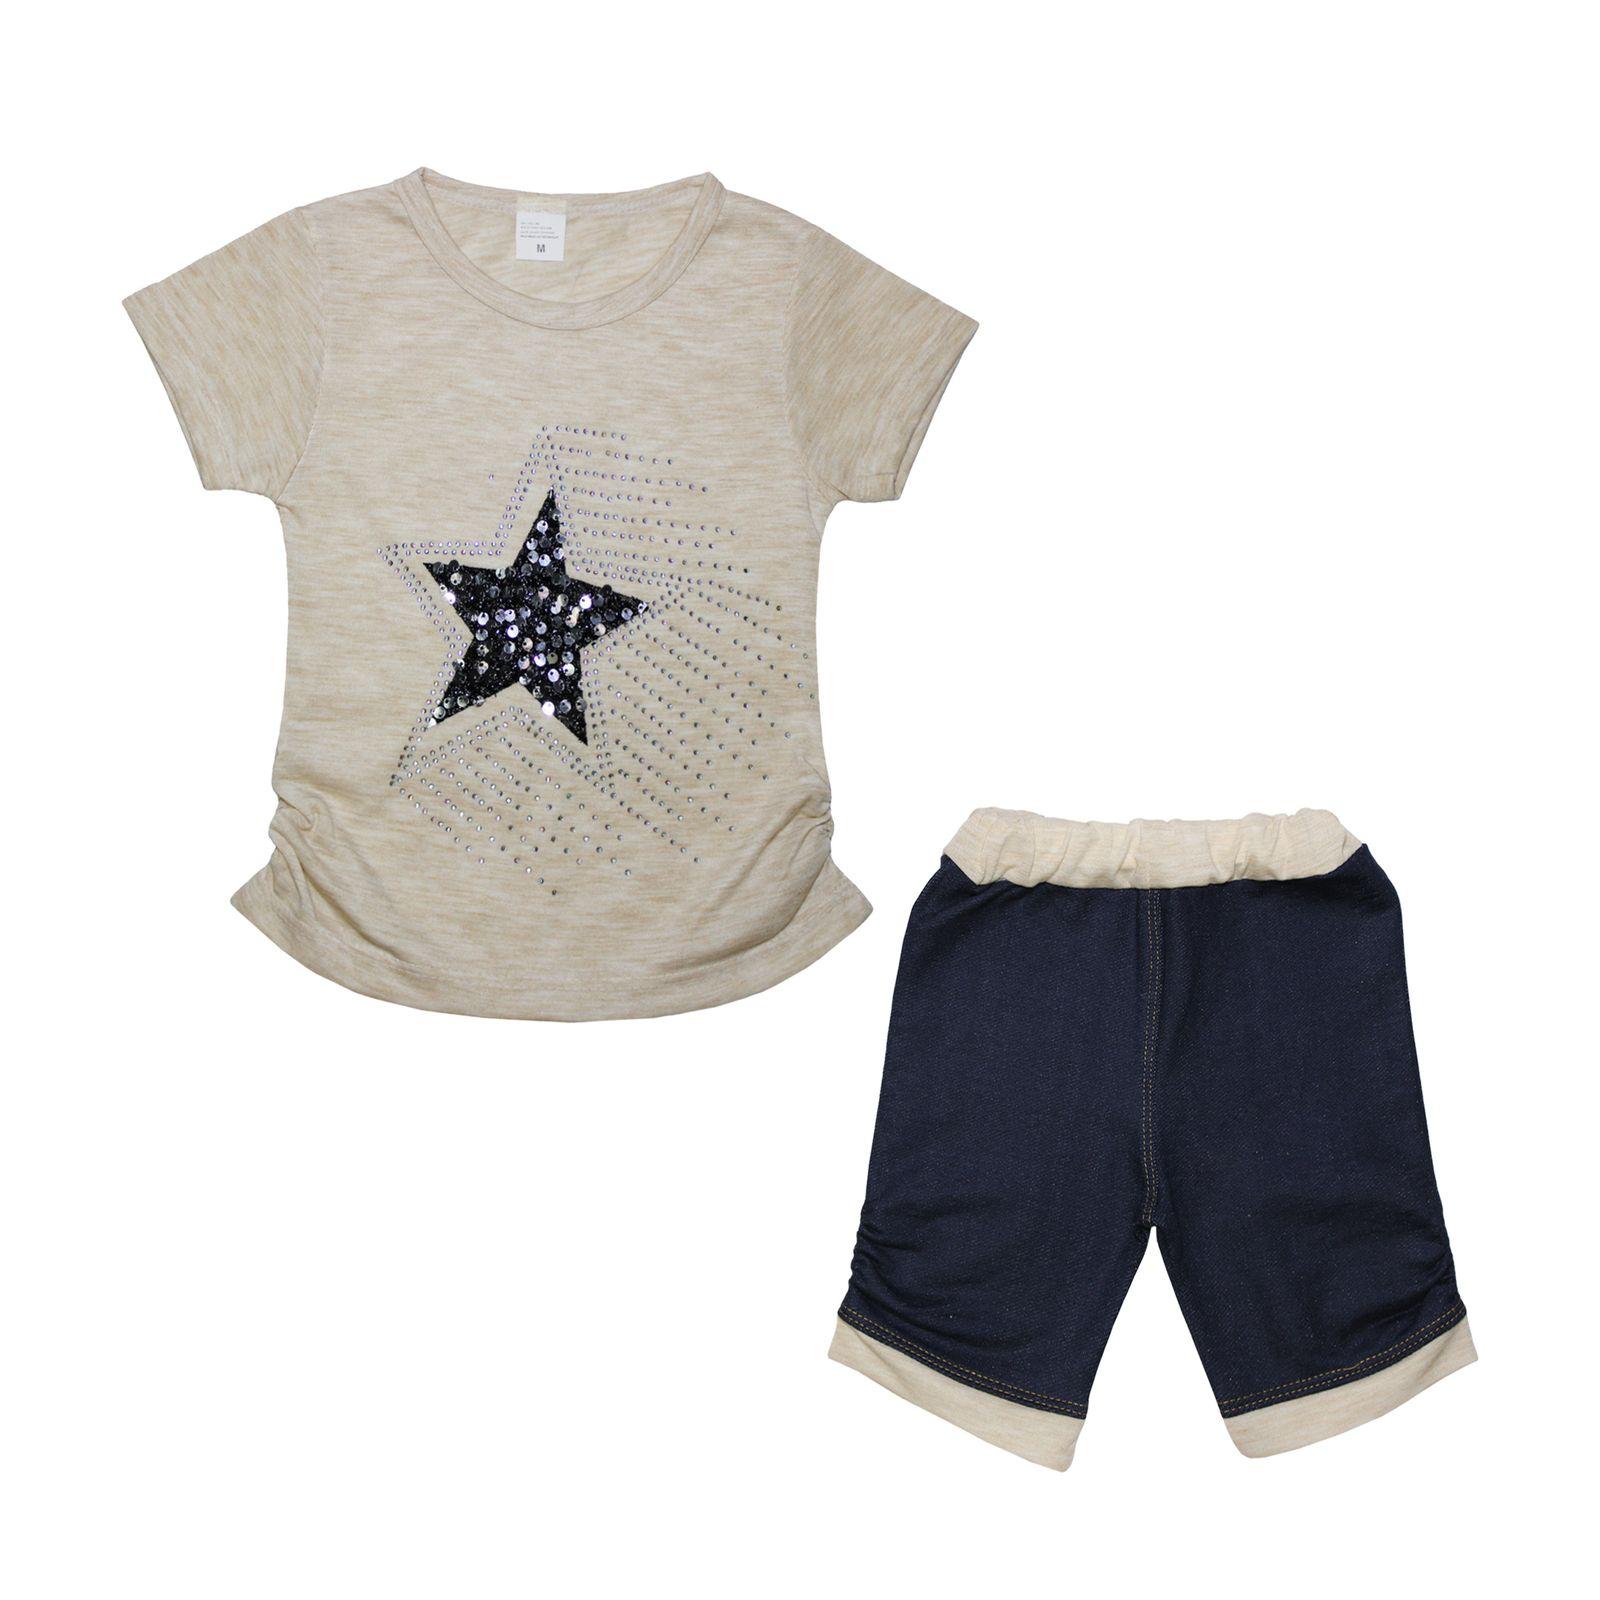 ست تیشرت و شلوارک دخترانه طرح ستاره کد ۱۳۶۱ -  - 2